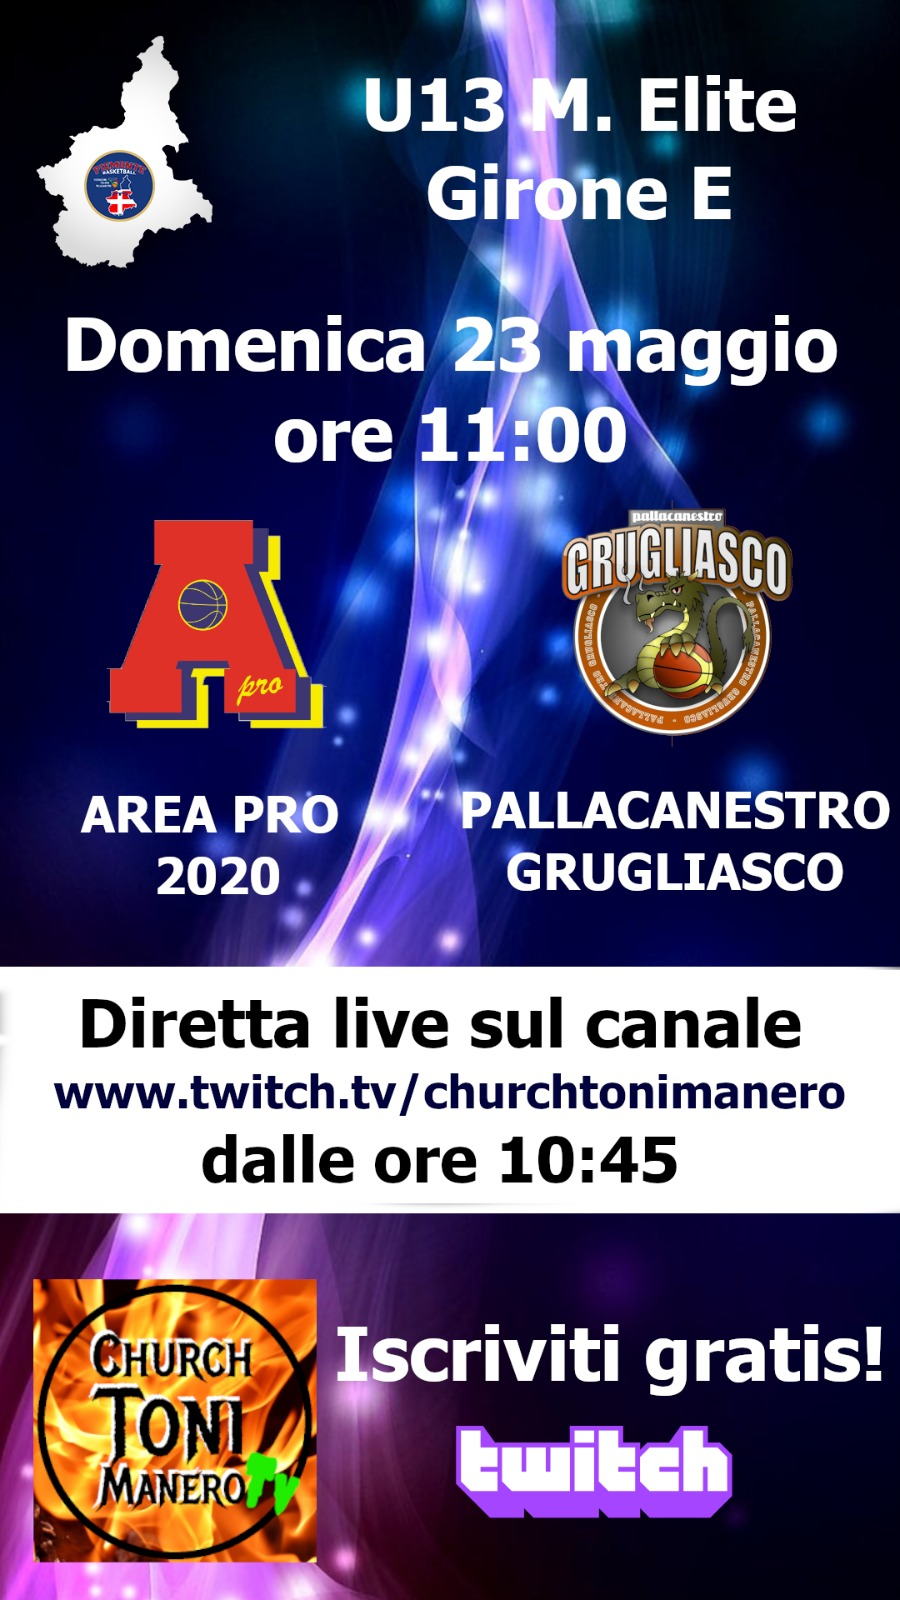 under 13 elite: Area Pro 2020-Grugliasco al Palasangone